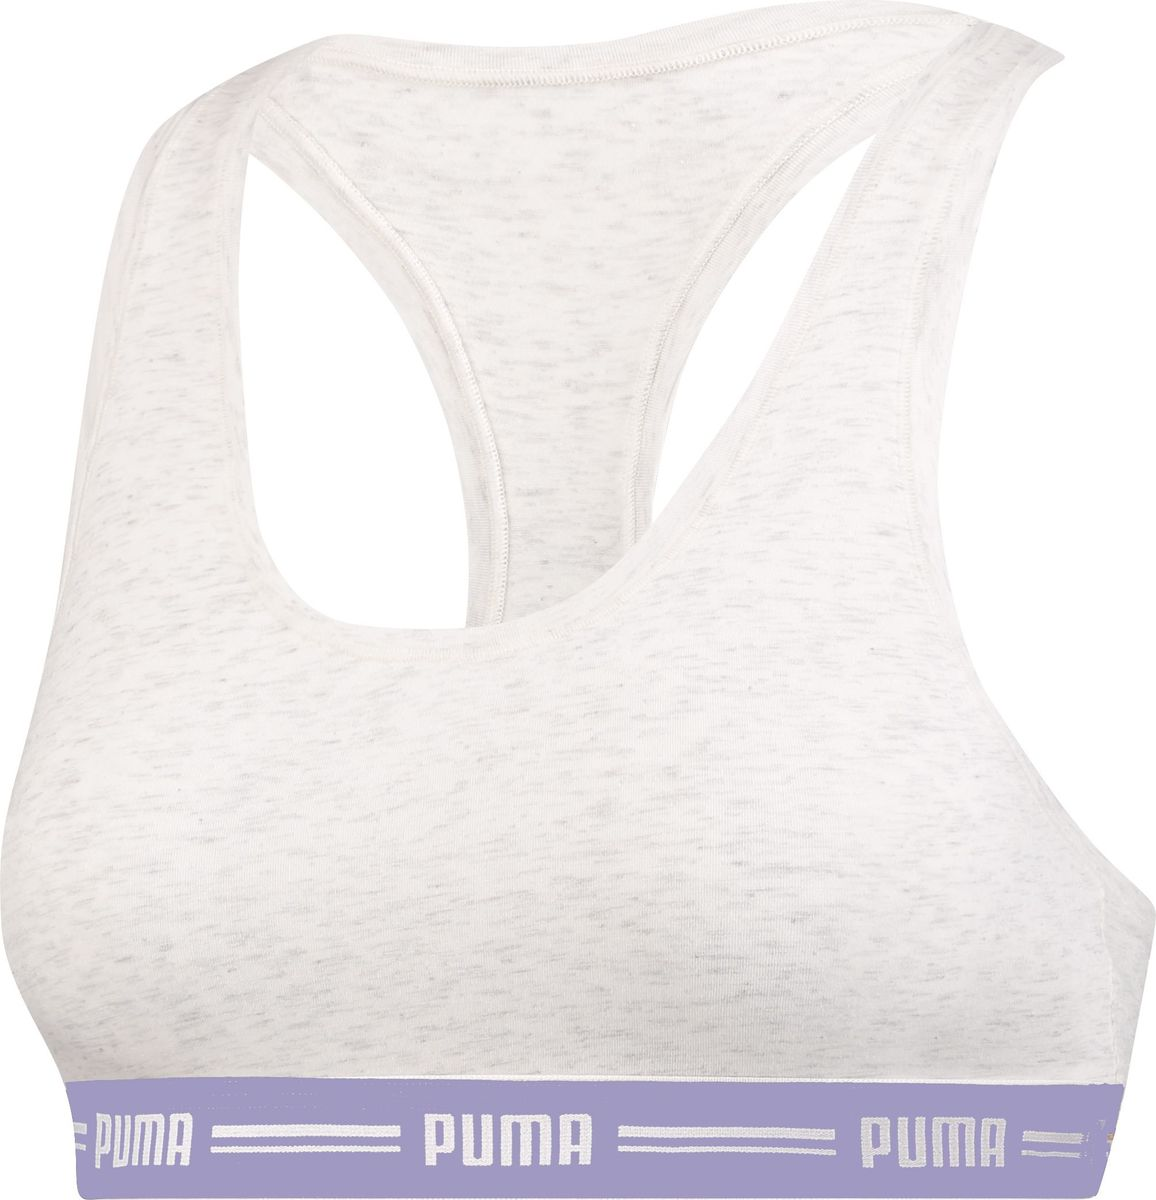 Топ-бра PUMA Iconic Racer Back Bra 1 racer back padded workout bra